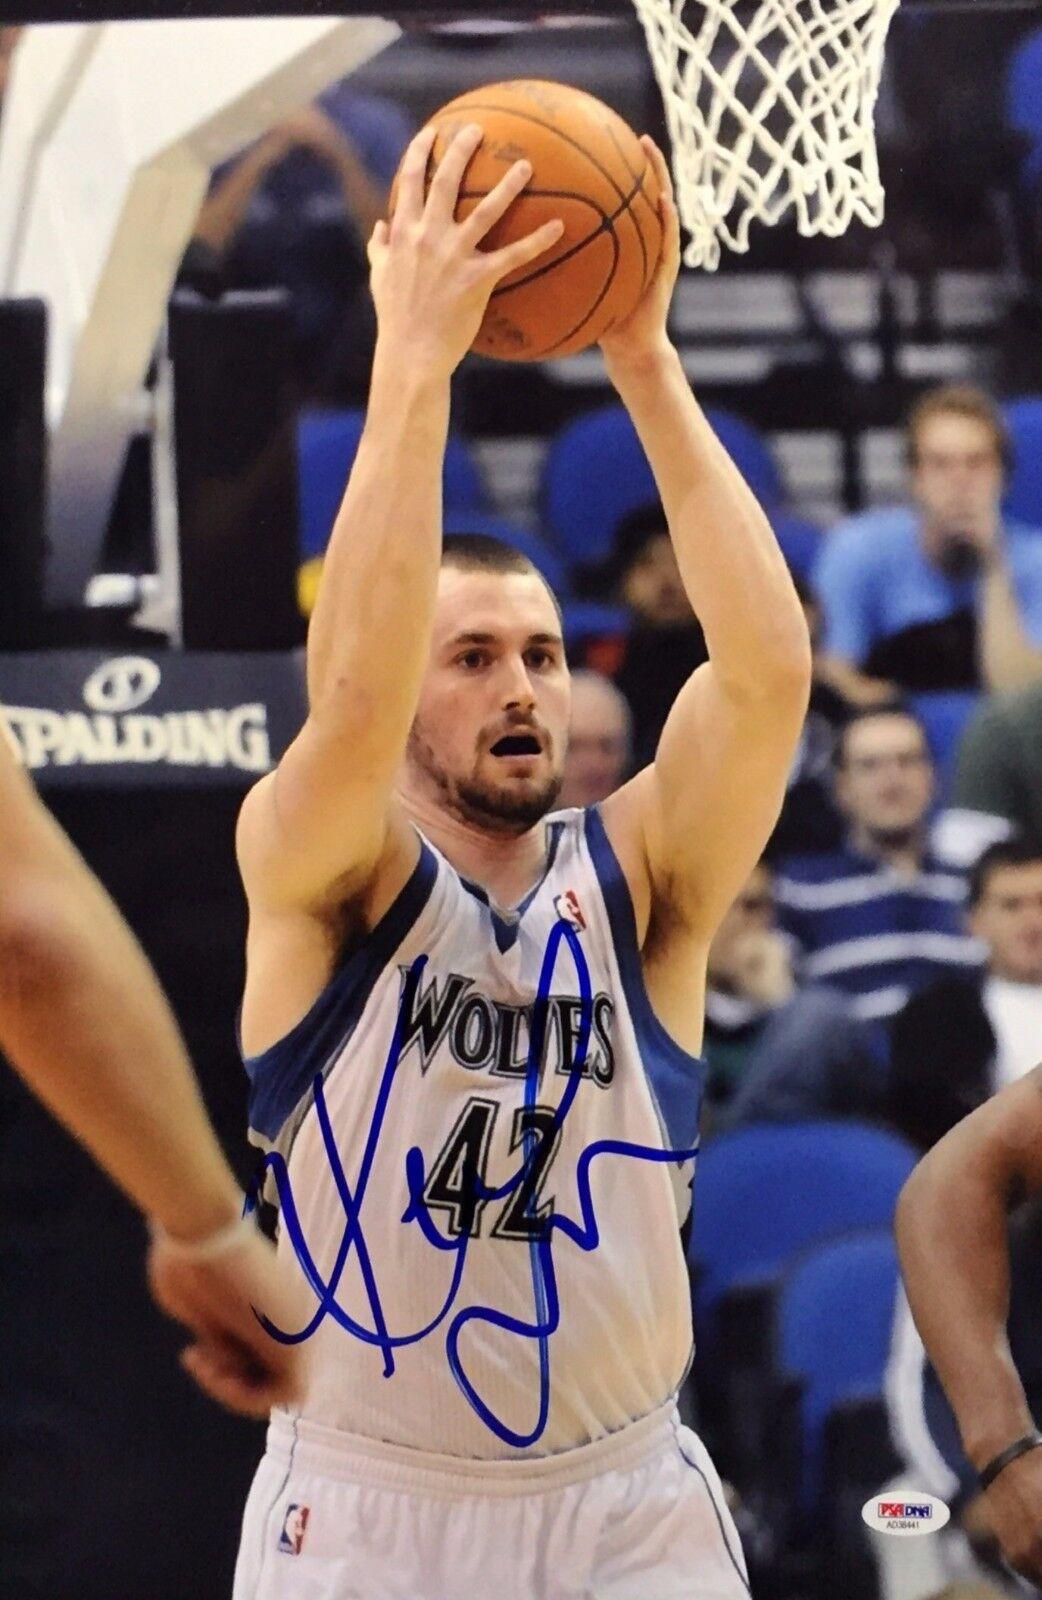 Kevin Love Signed Minnesota Timberwolves Basketball 12x18 Photo PSA AD38441